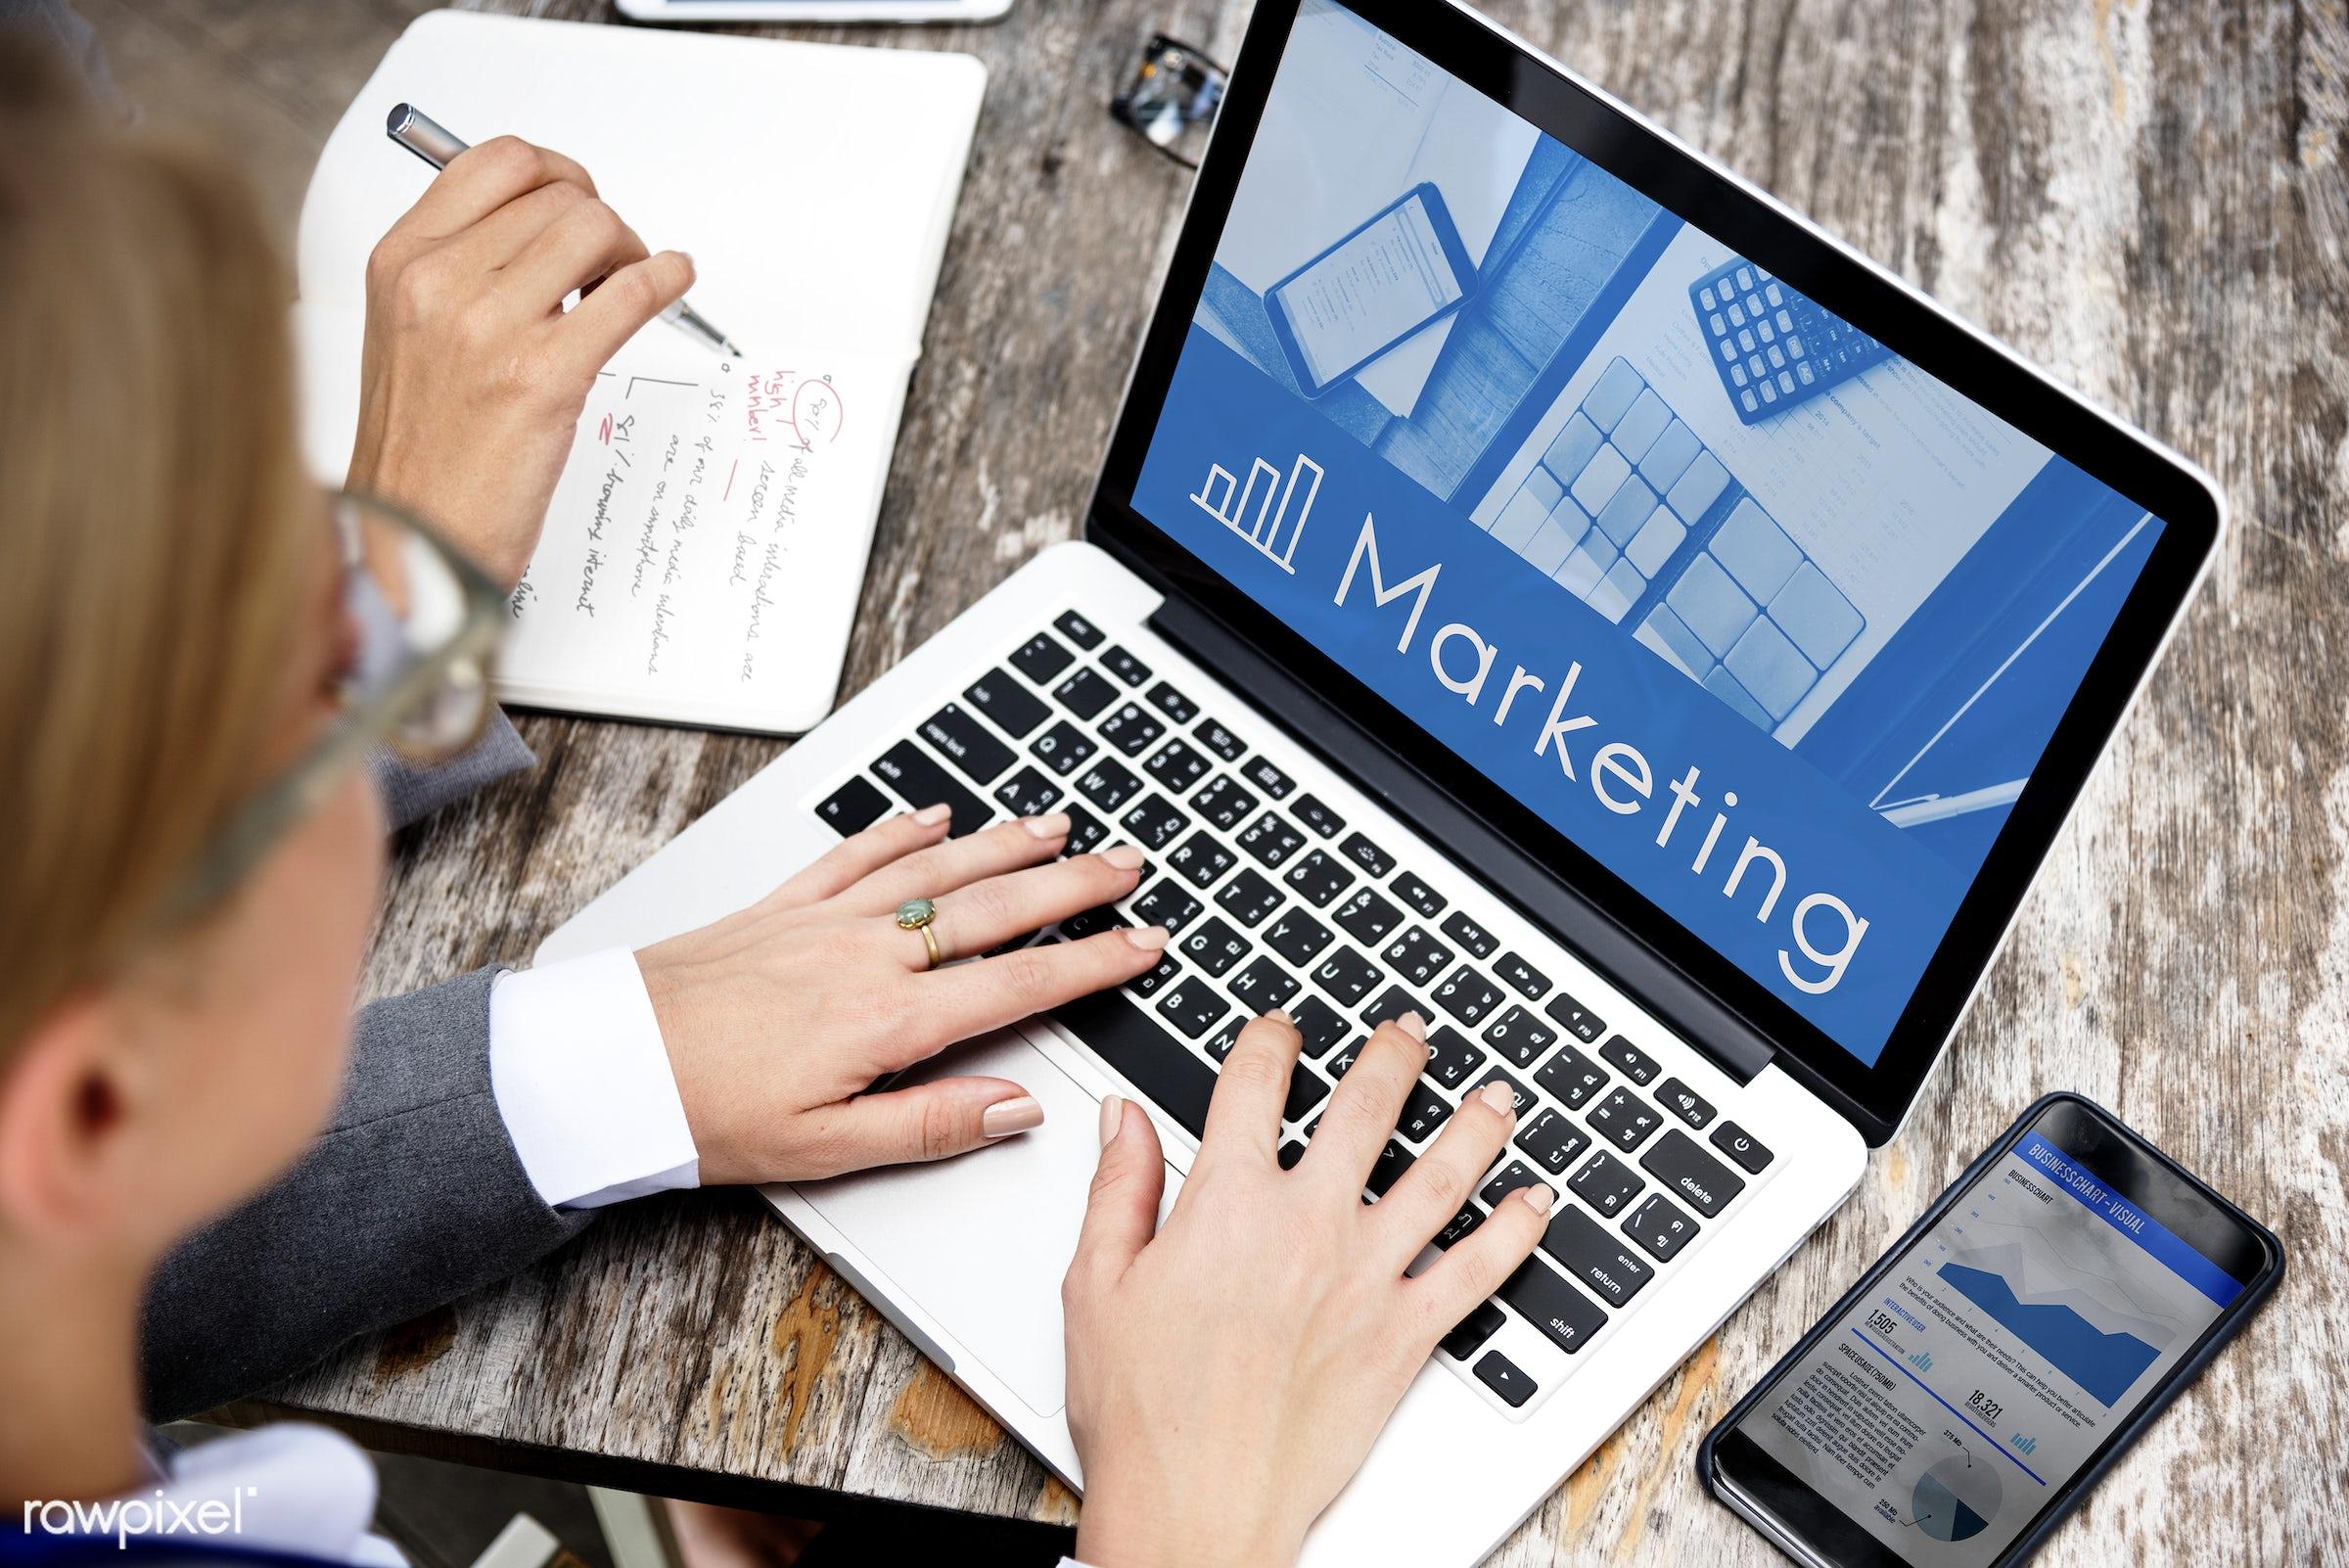 advertise, awareness, business, businesswoman, businesswomen, career, chart, computer, devices, digital, digital device,...